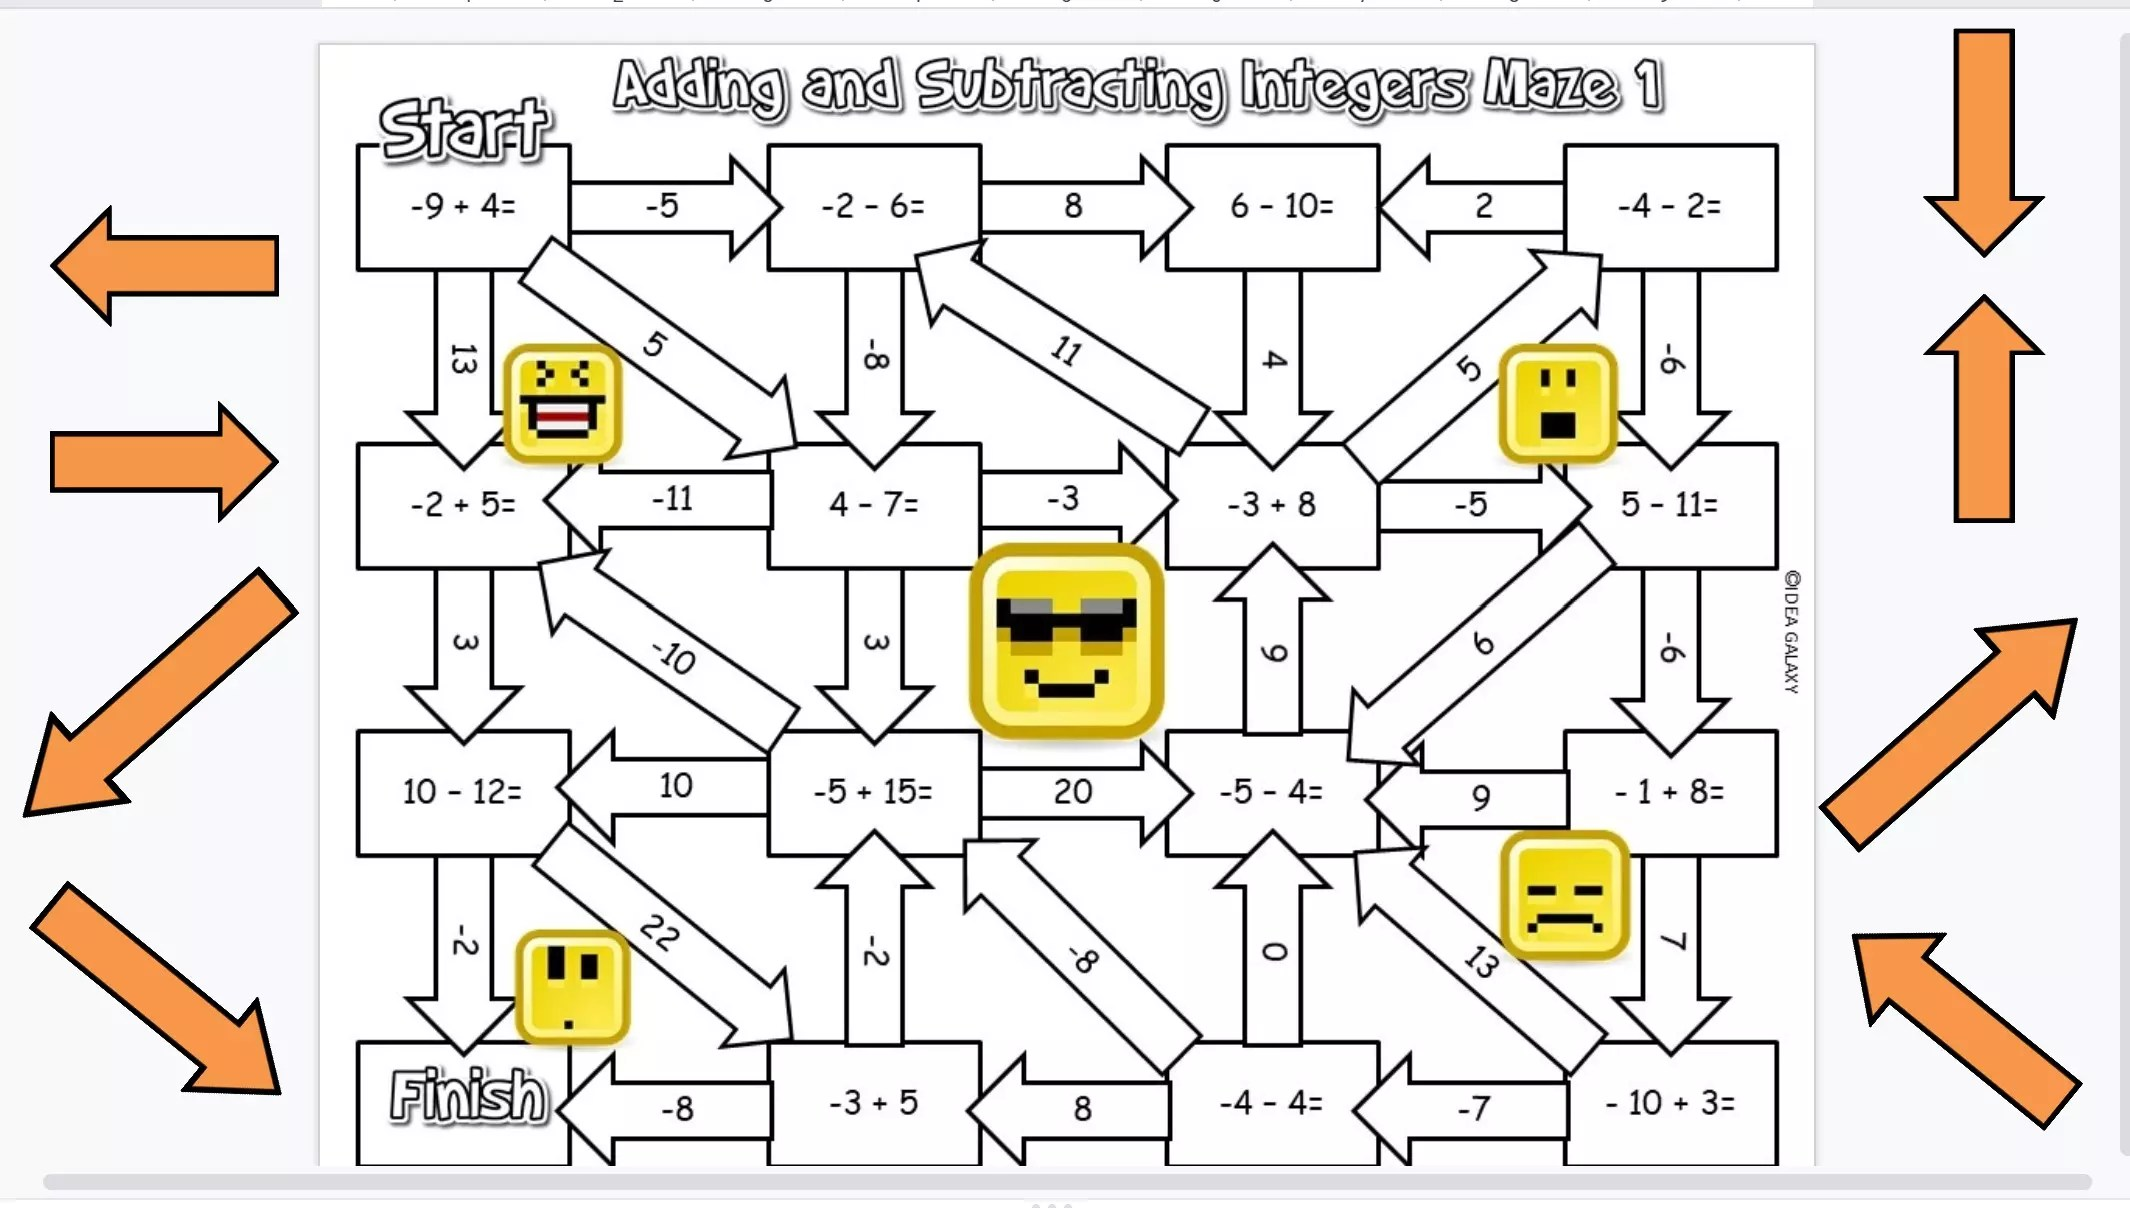 12 Engaging Ways To Practice Adding Integers - Idea Galaxy